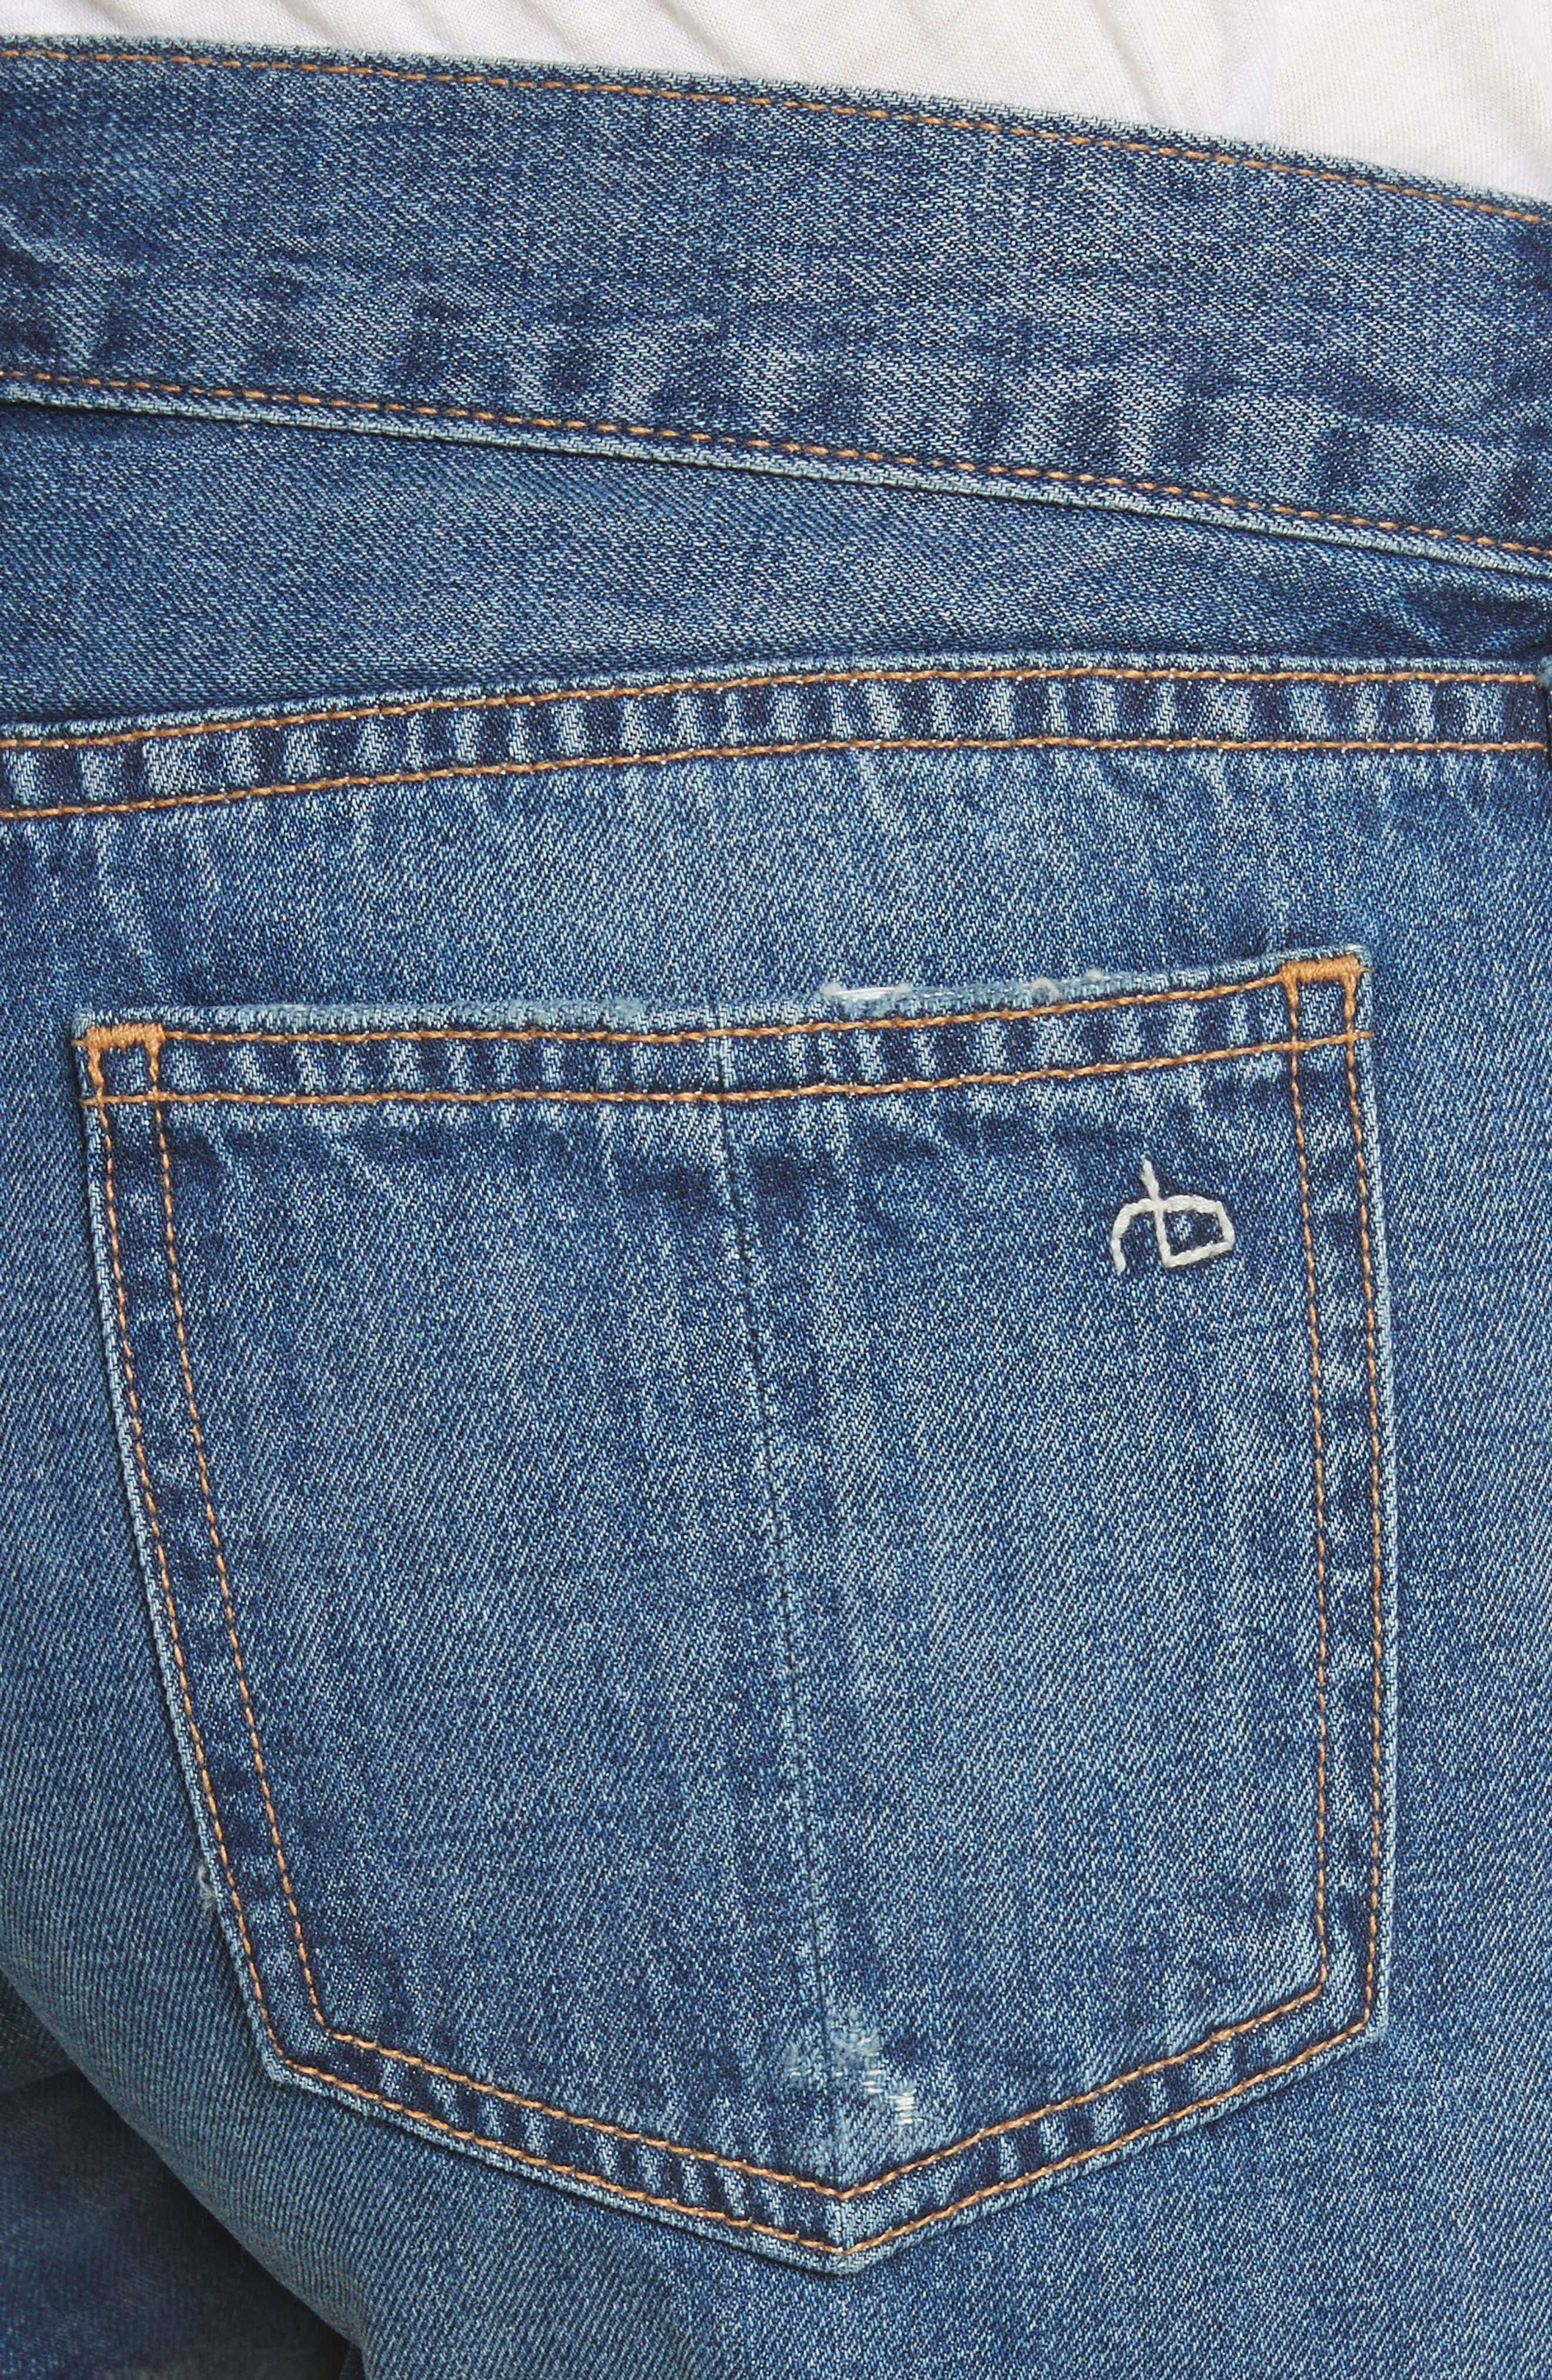 Cutoff Denim Shorts,                             Alternate thumbnail 4, color,                             Johnny